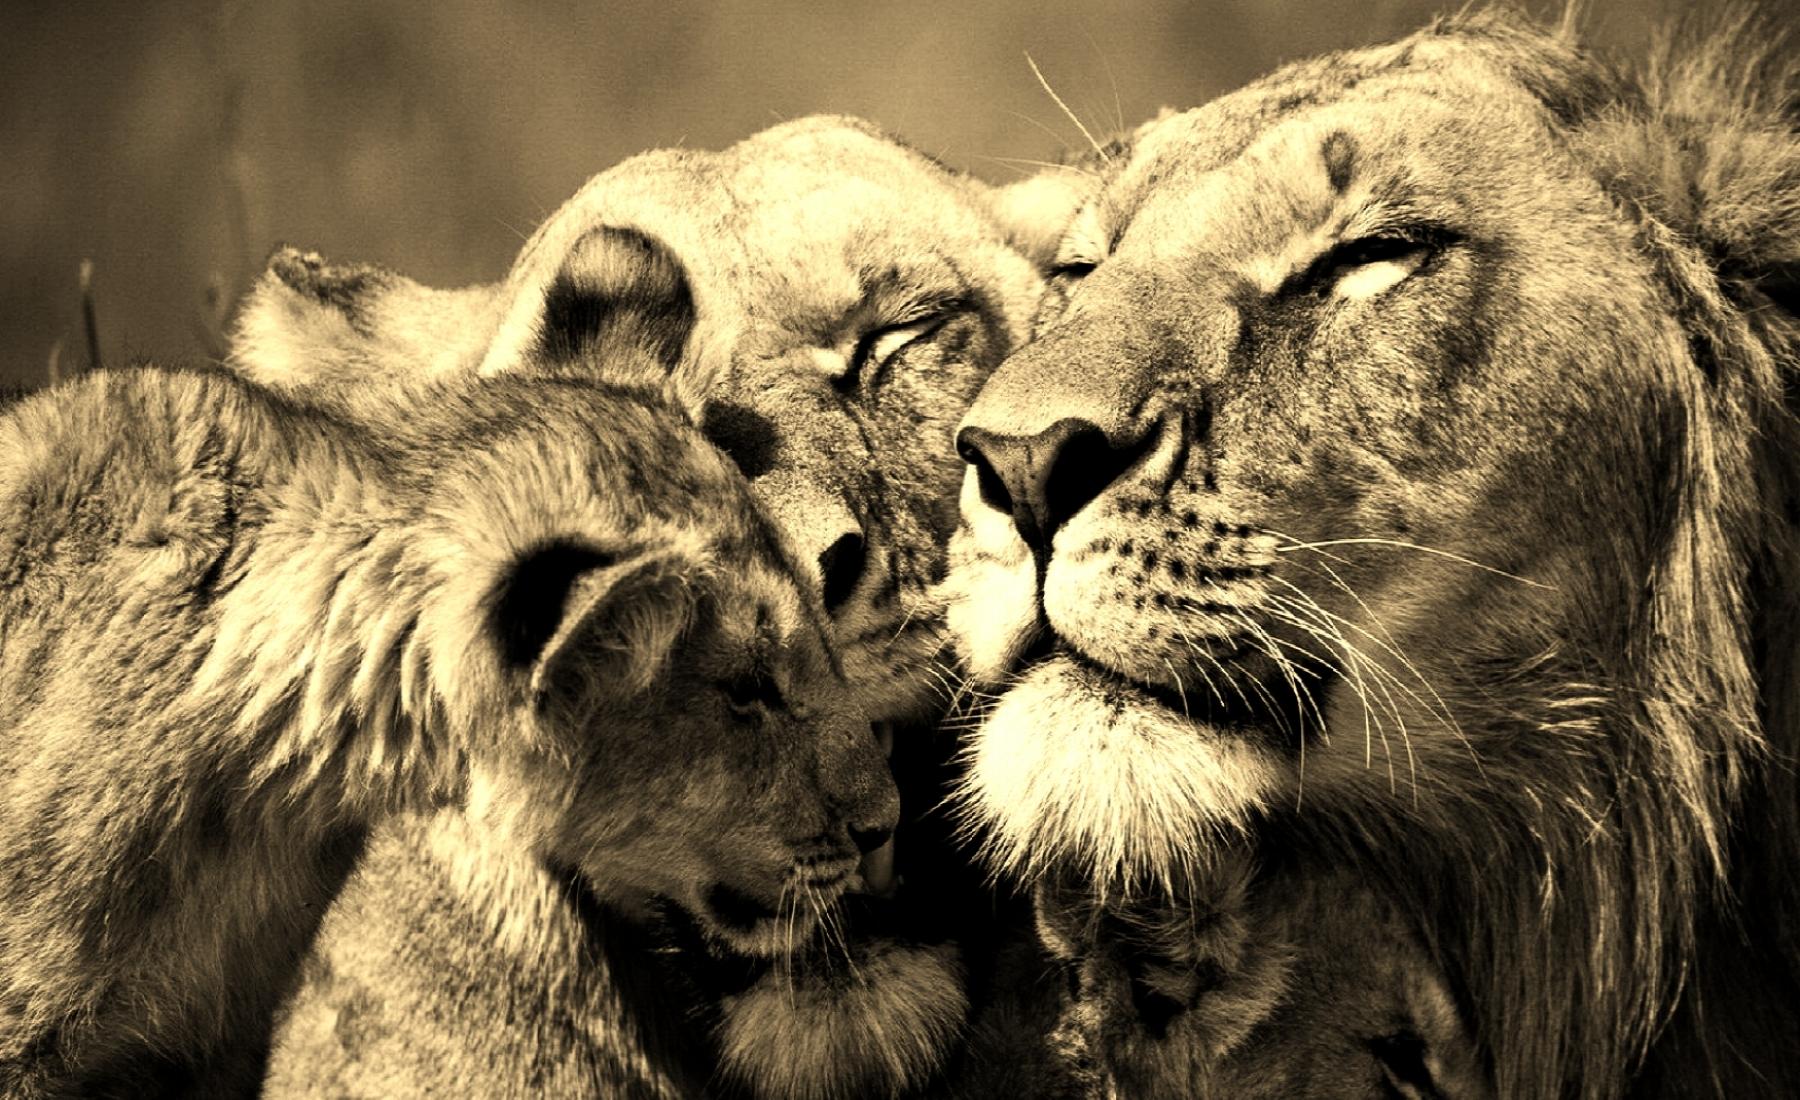 1600x1200-lion-pride-wallpaper.jpg